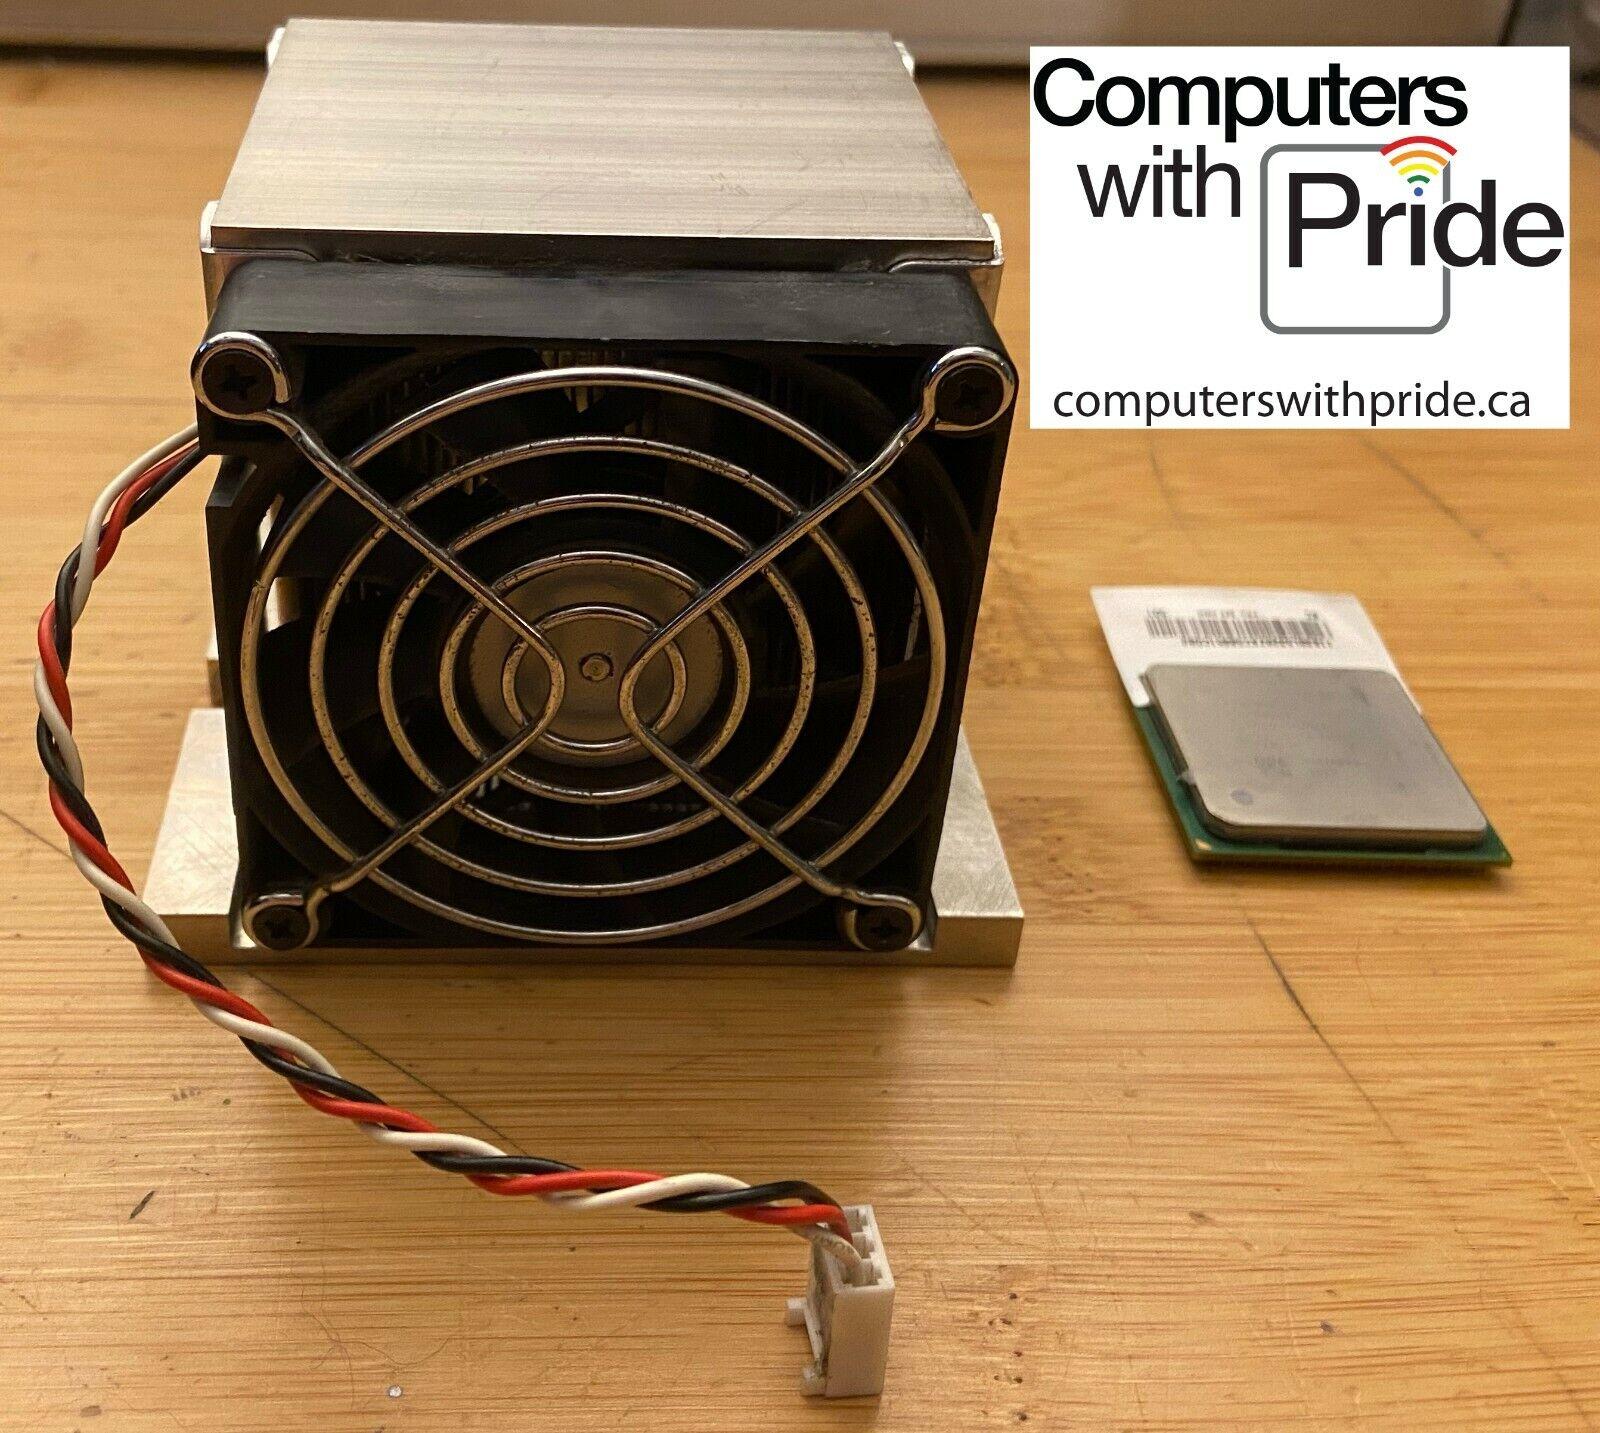 Intel Pentium 4 2.80GHz/1M/533 Socket PPGA478 & PLGA775 (SL7E2) with Heatsink